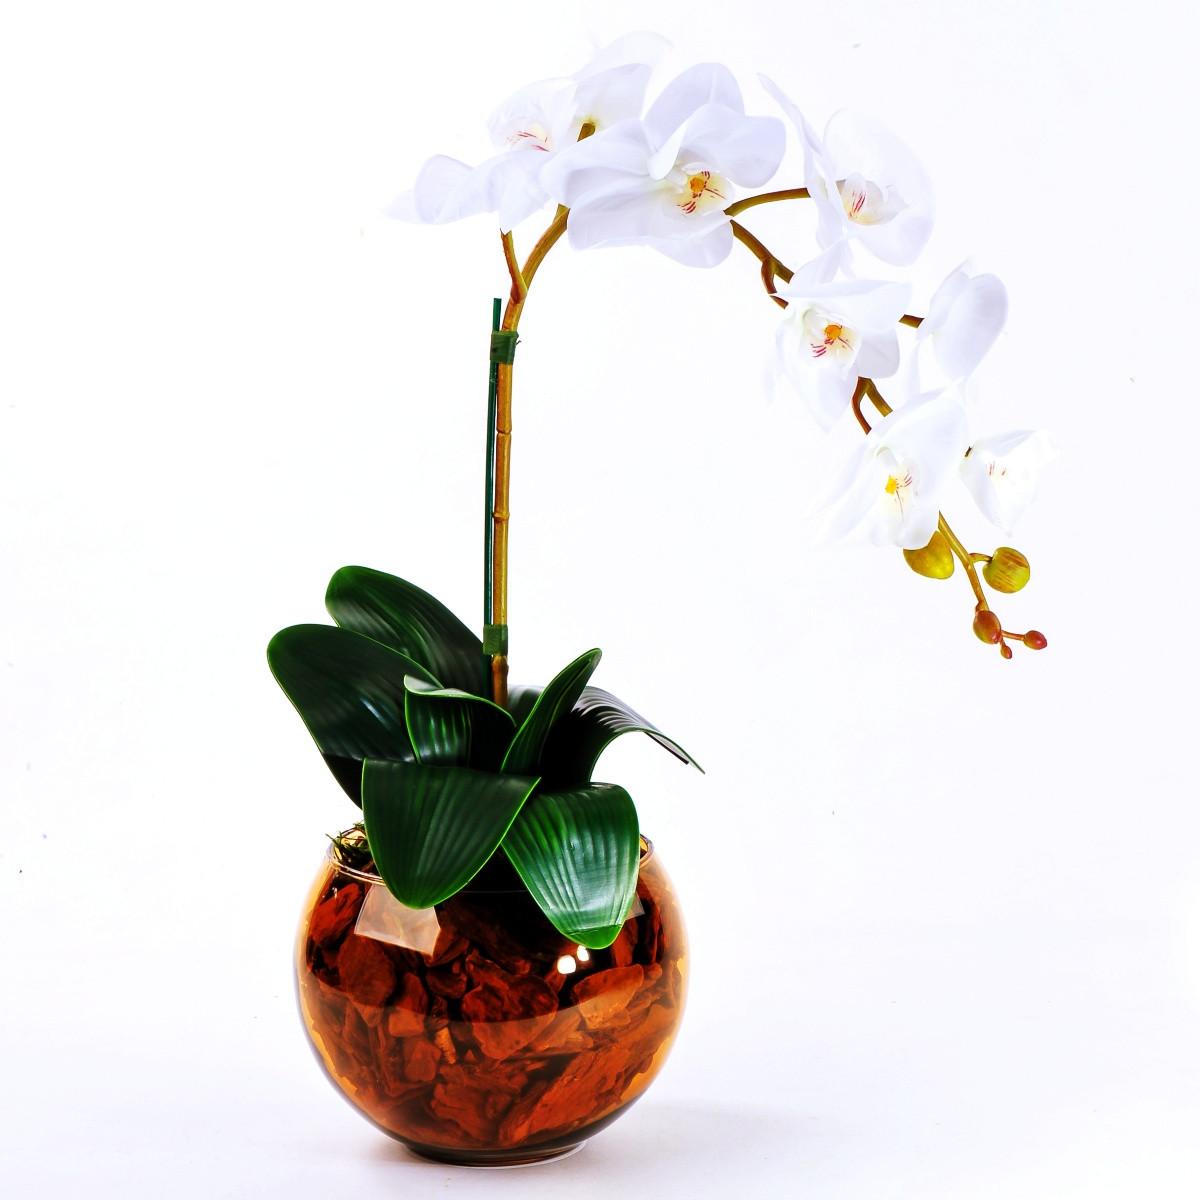 Arranjo de Orquídea Artificial Branca em Aquário Ambar